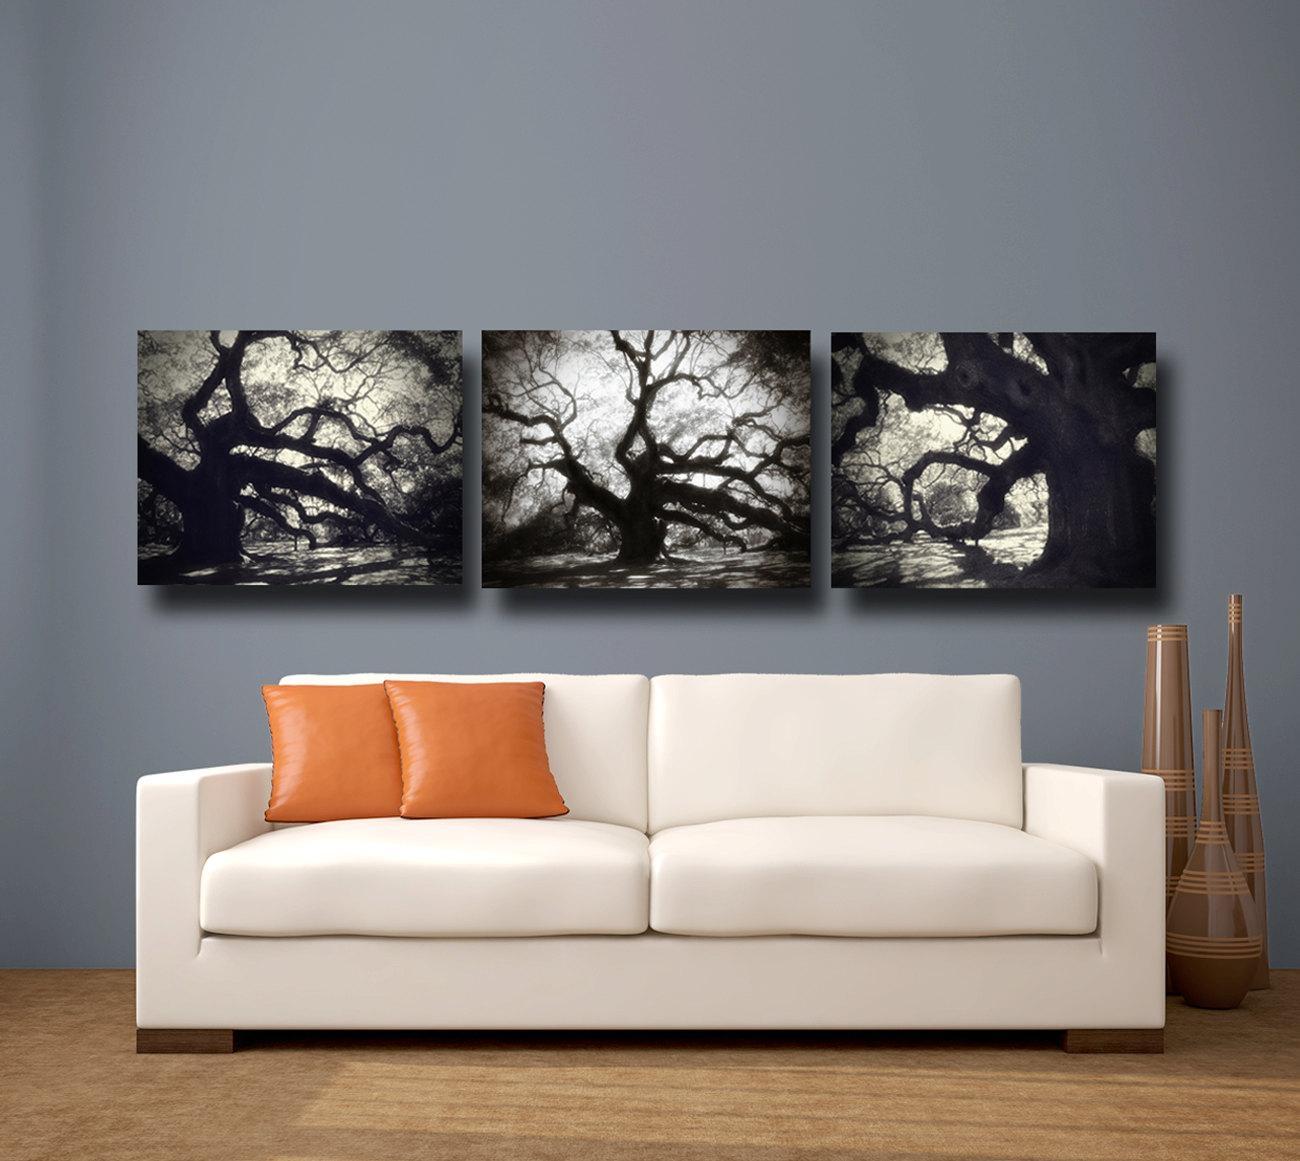 Wall Art Designs: Wall Canvas Art On Demand Free Printable Cheap Within Big Cheap Wall Art (Image 19 of 20)